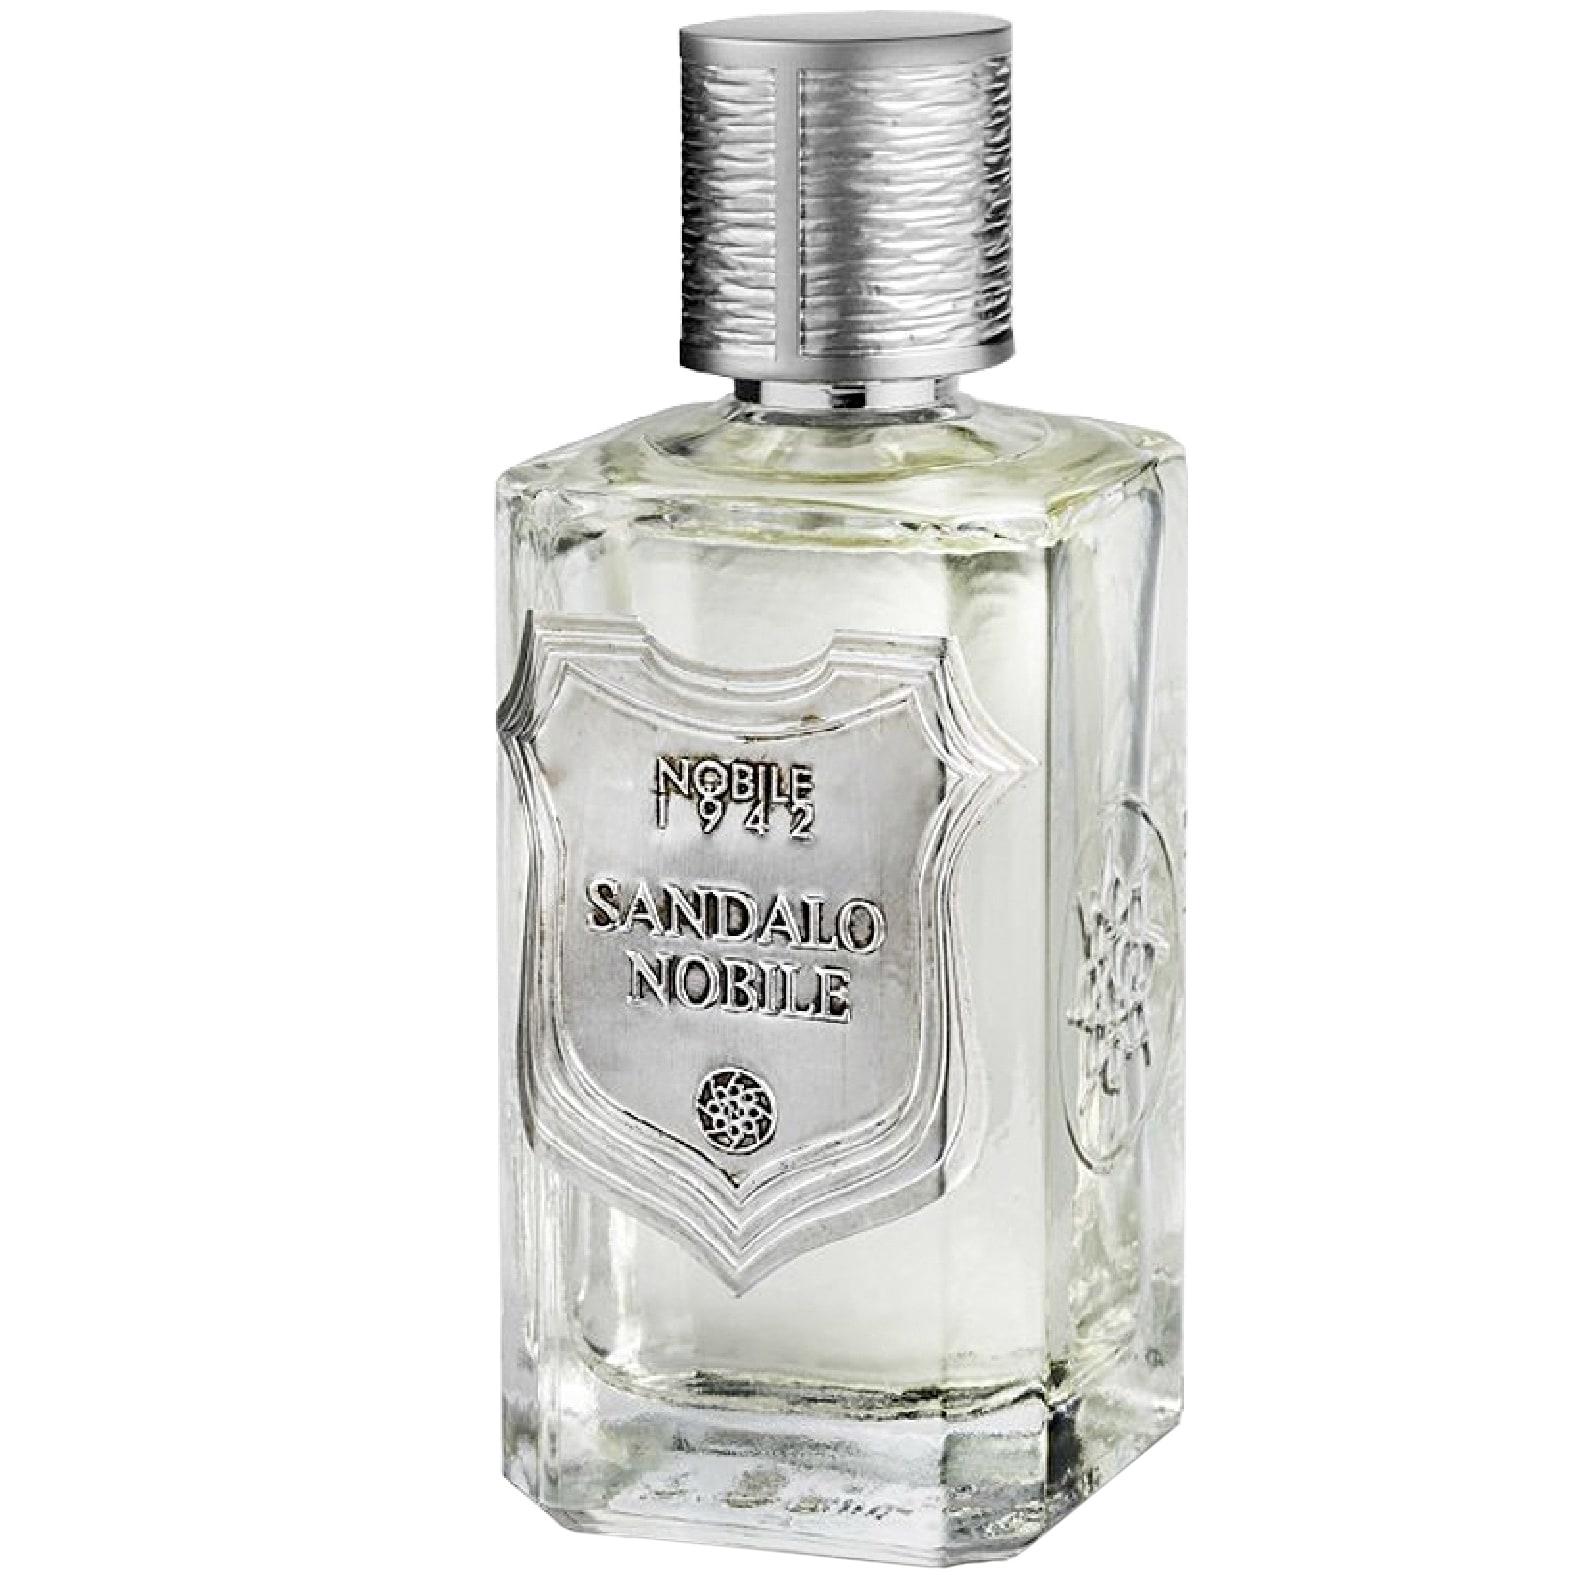 Парфюмированная вода Nobile 1942 Sandalo Nobile